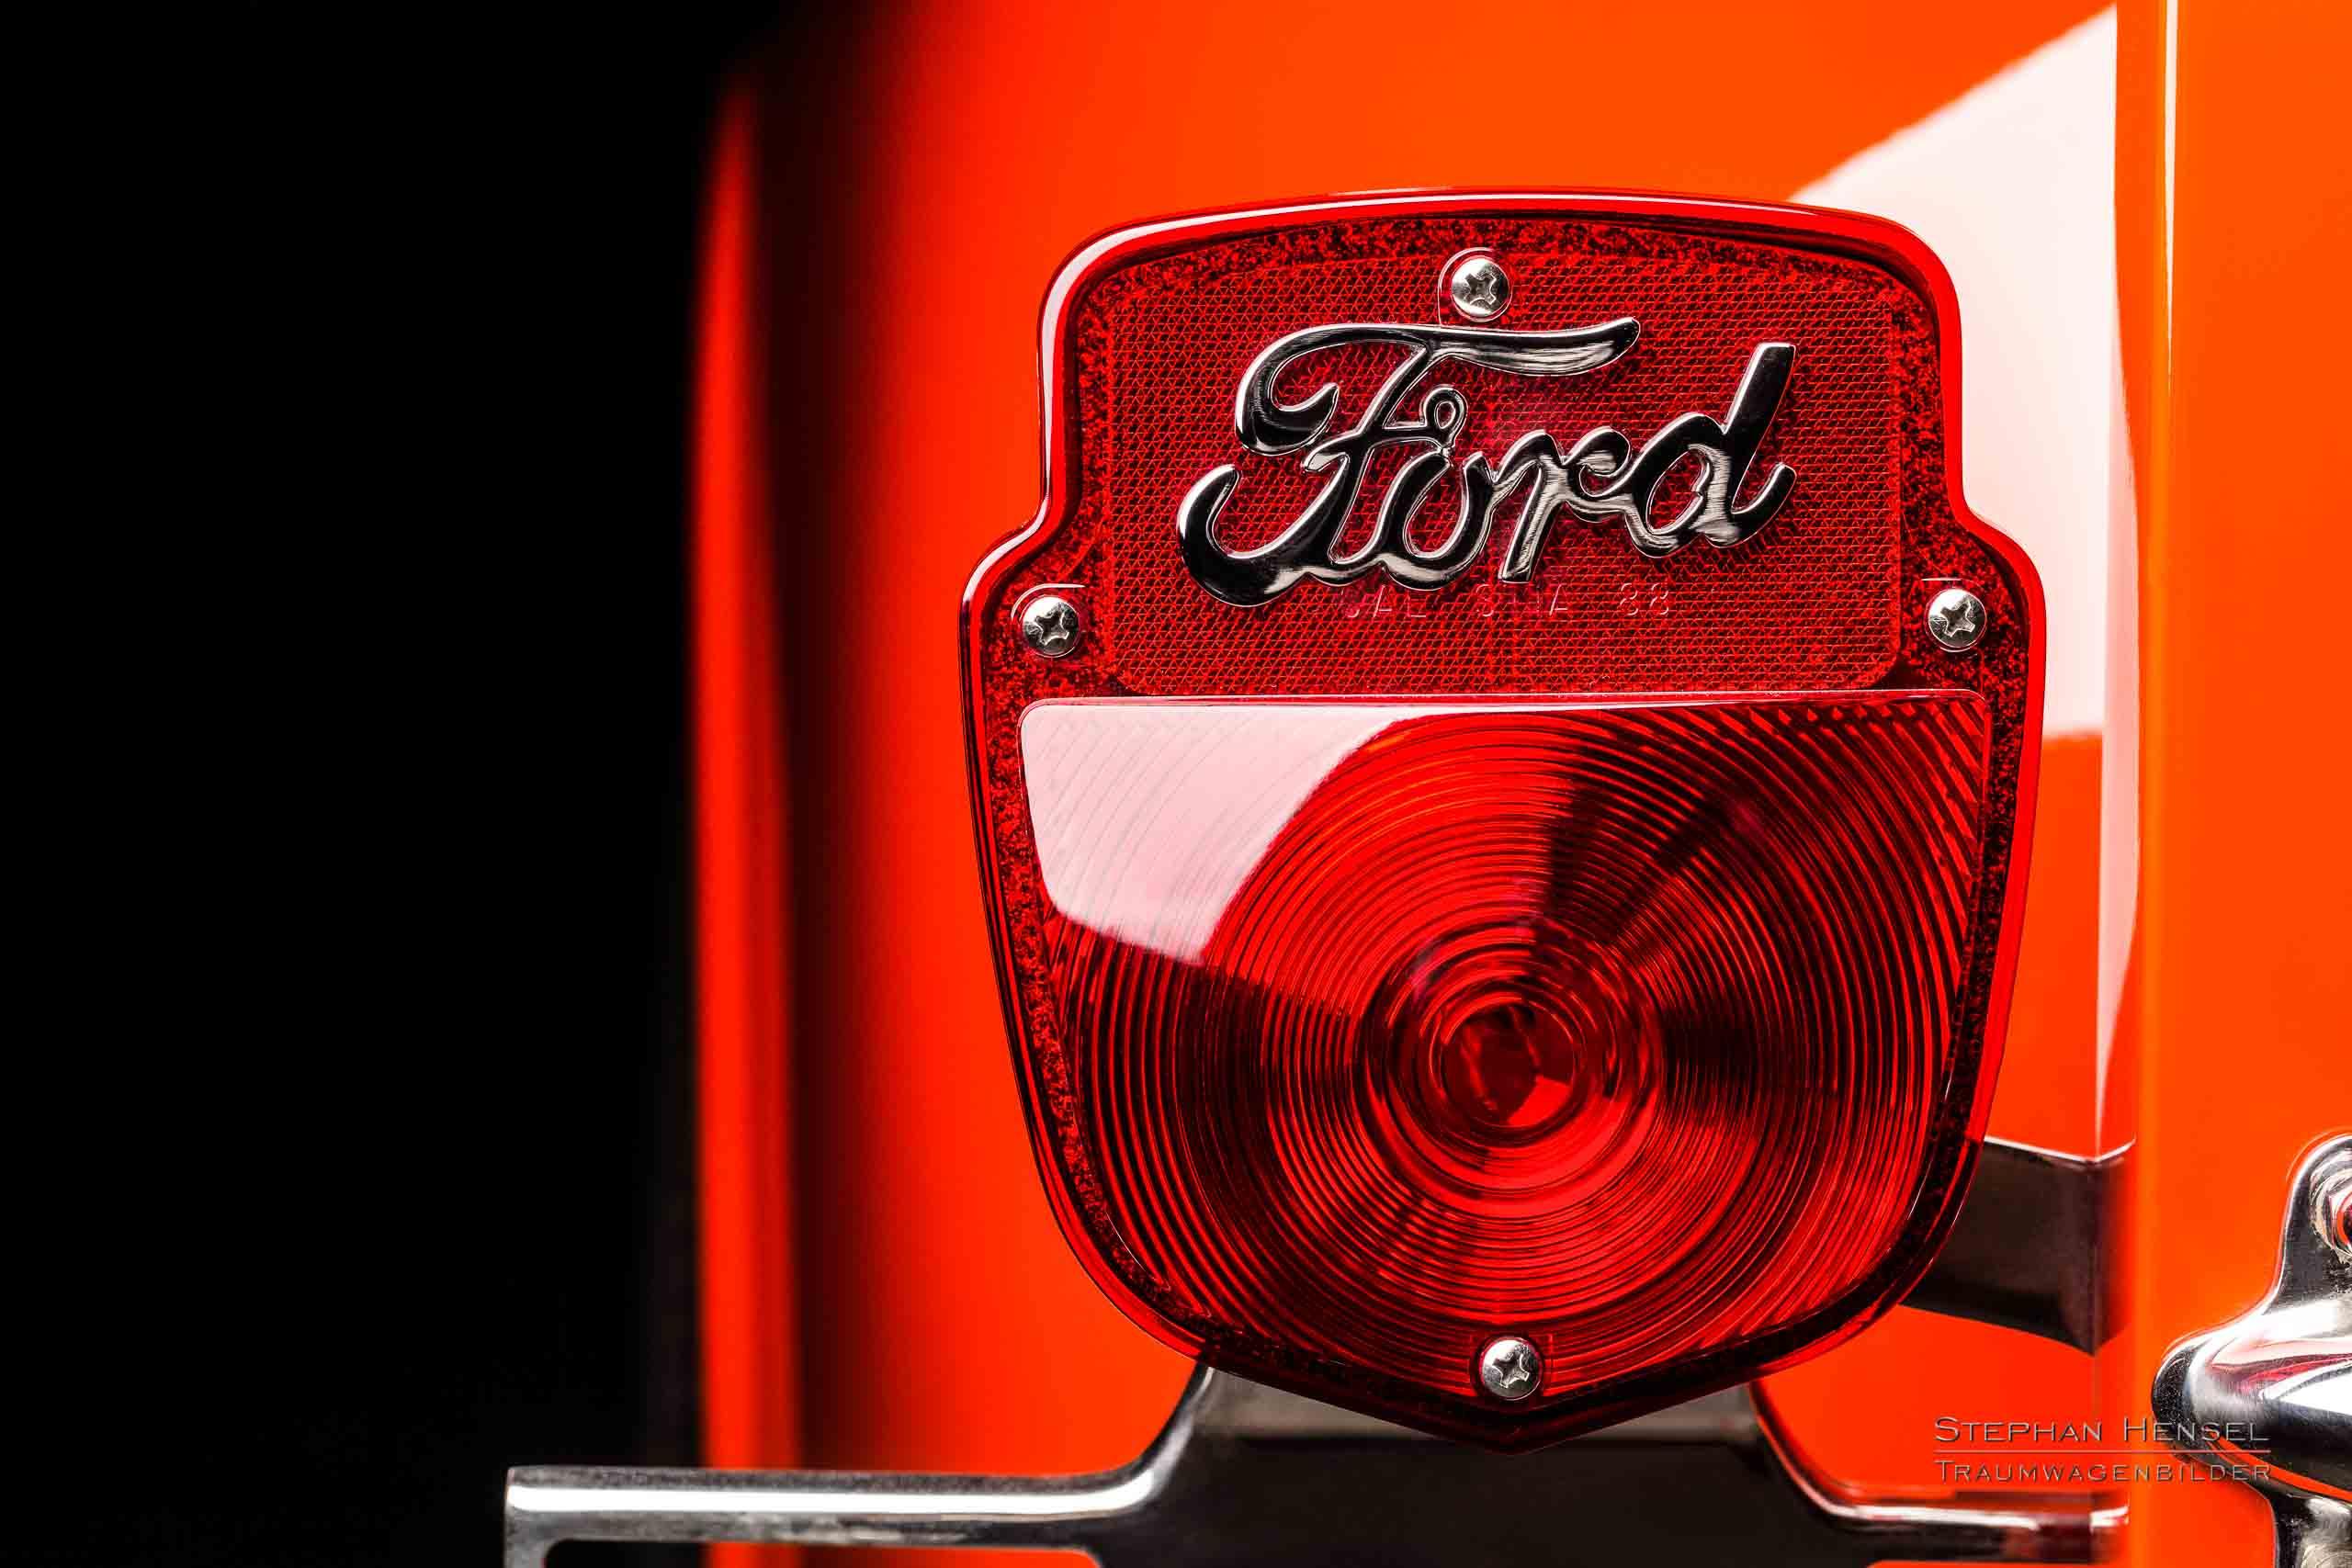 Ford F-100, Detailansicht Rücklicht links, Autofotograf: Stephan Hensel, Oldtimerfotograf, Hamburg